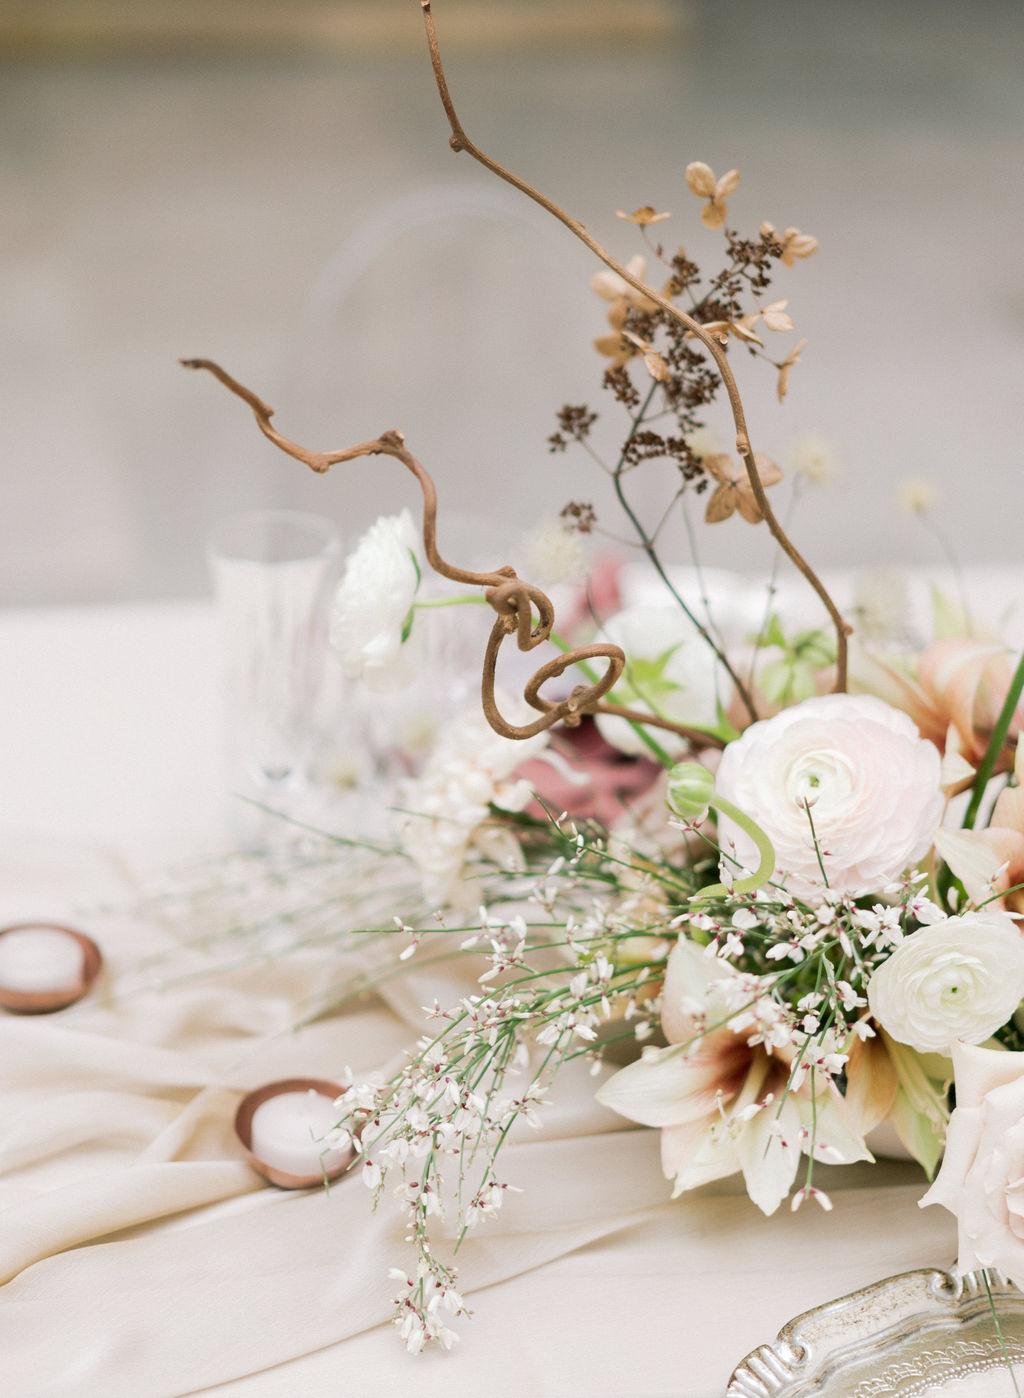 artiese-ago-wedding-editorial-06659.jpg